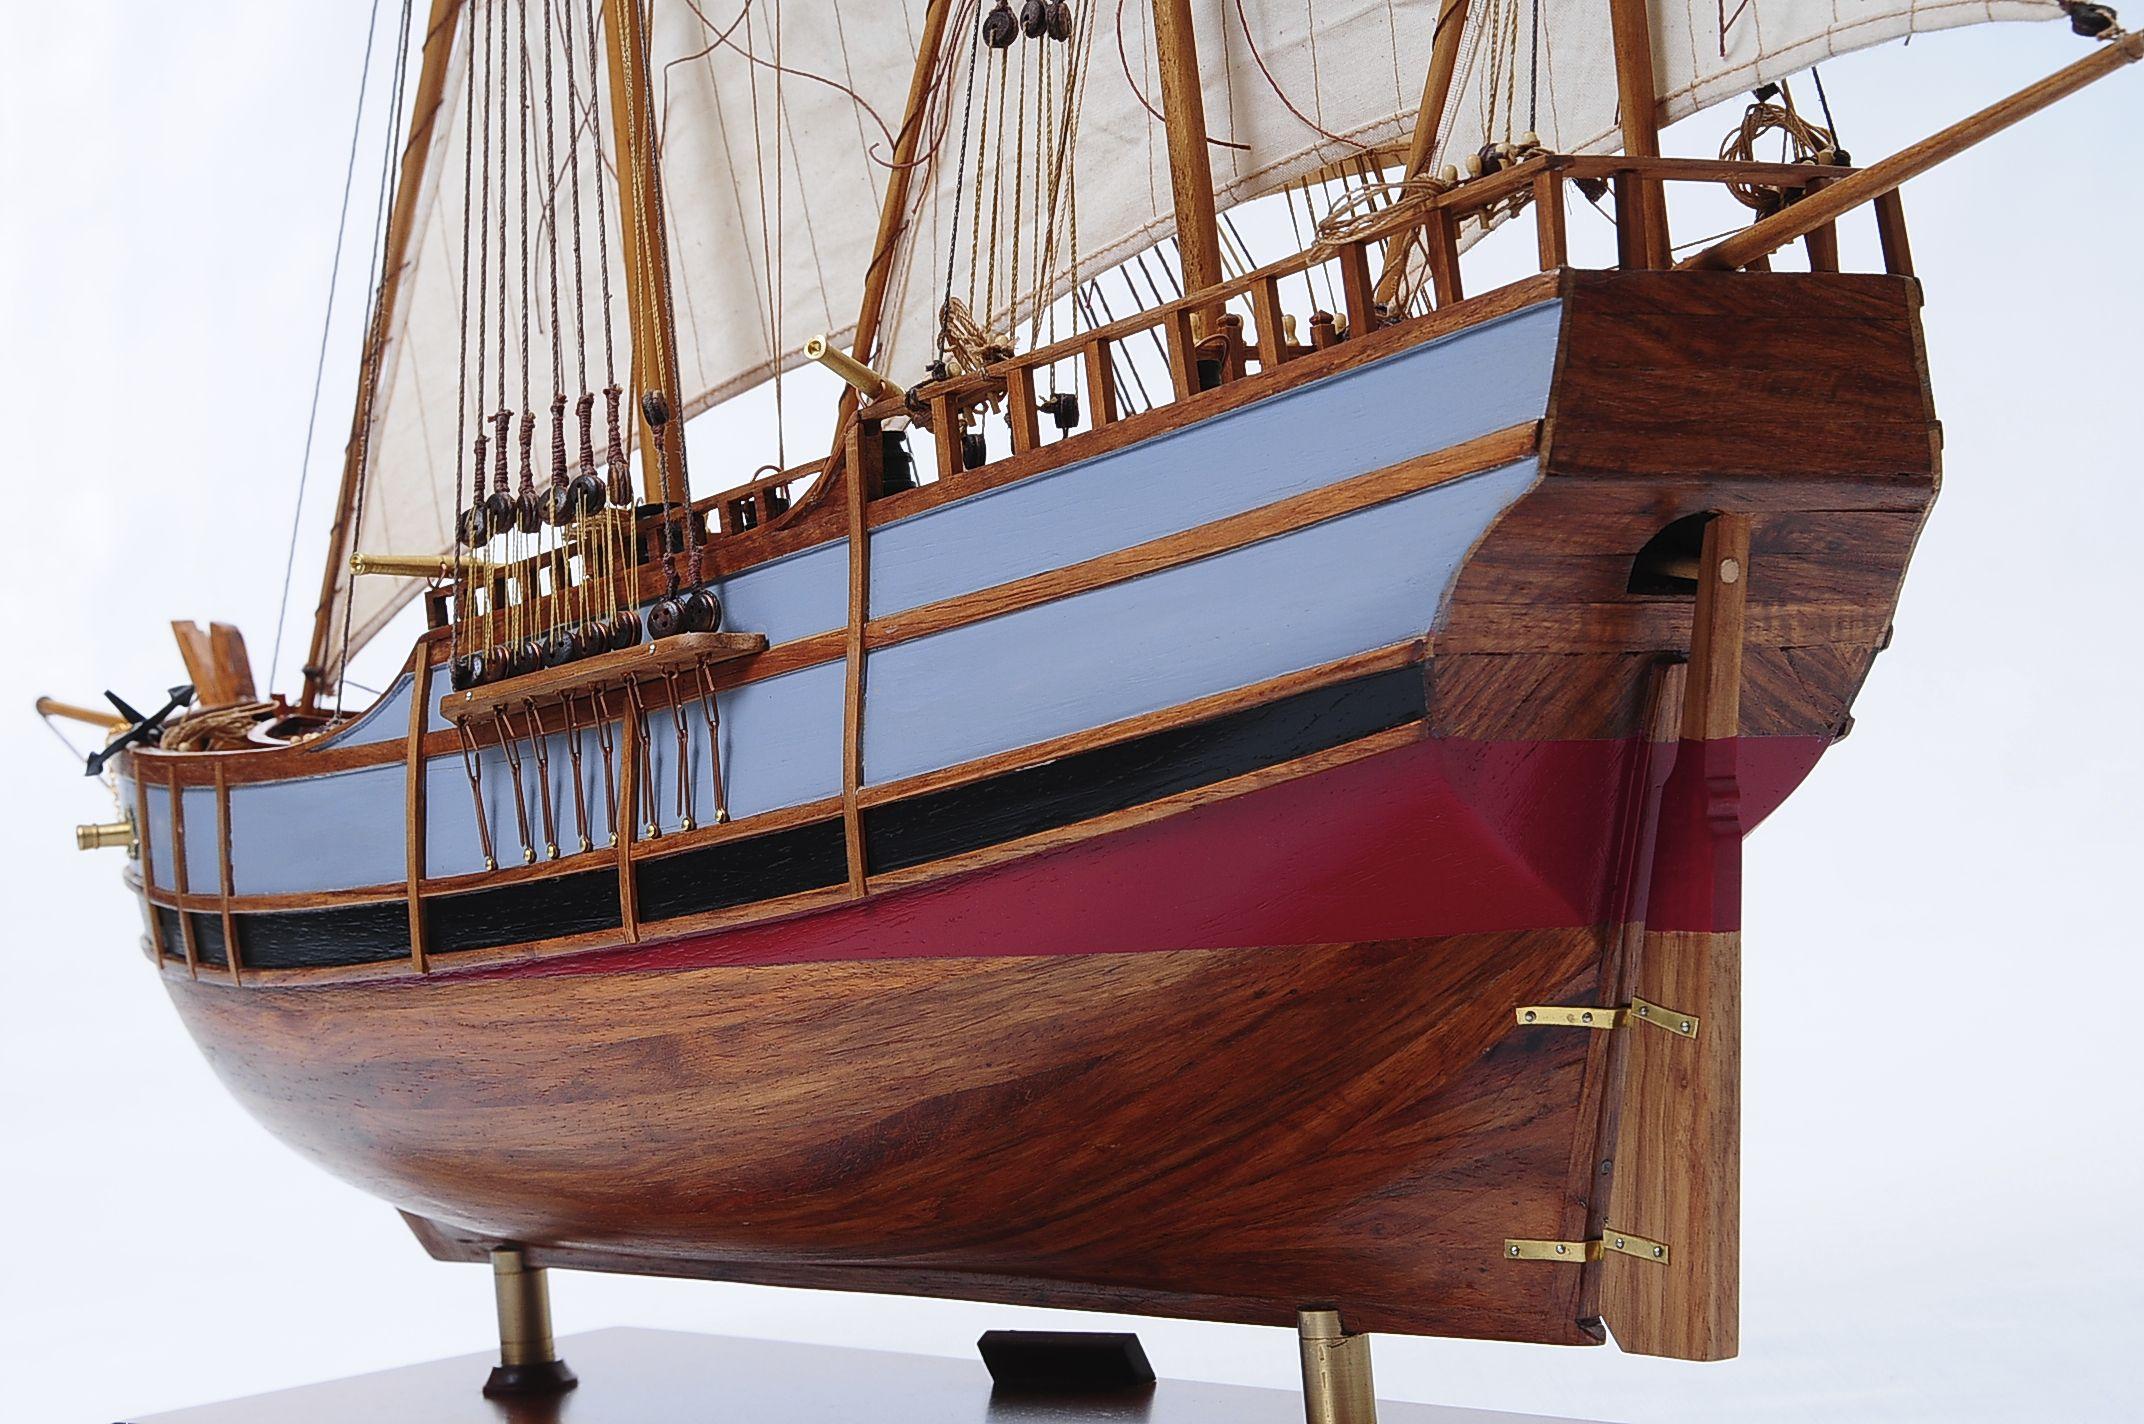 1429-6037-La-Nina-Model-Boat-Superior-Range